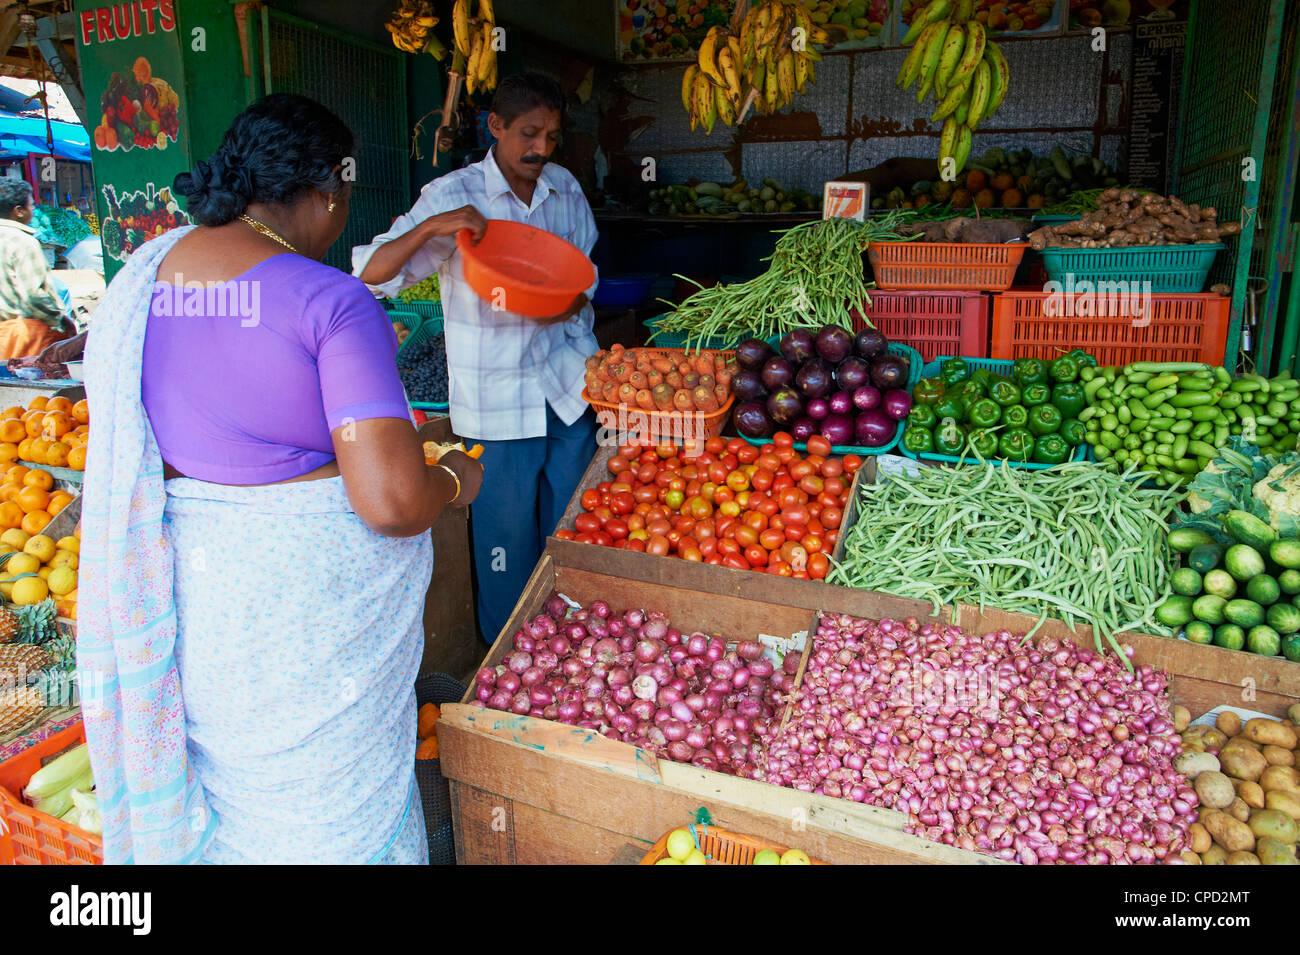 Mercato della frutta, Trivandrum (Thiruvananthapuram), Kerala, India, Asia Immagini Stock